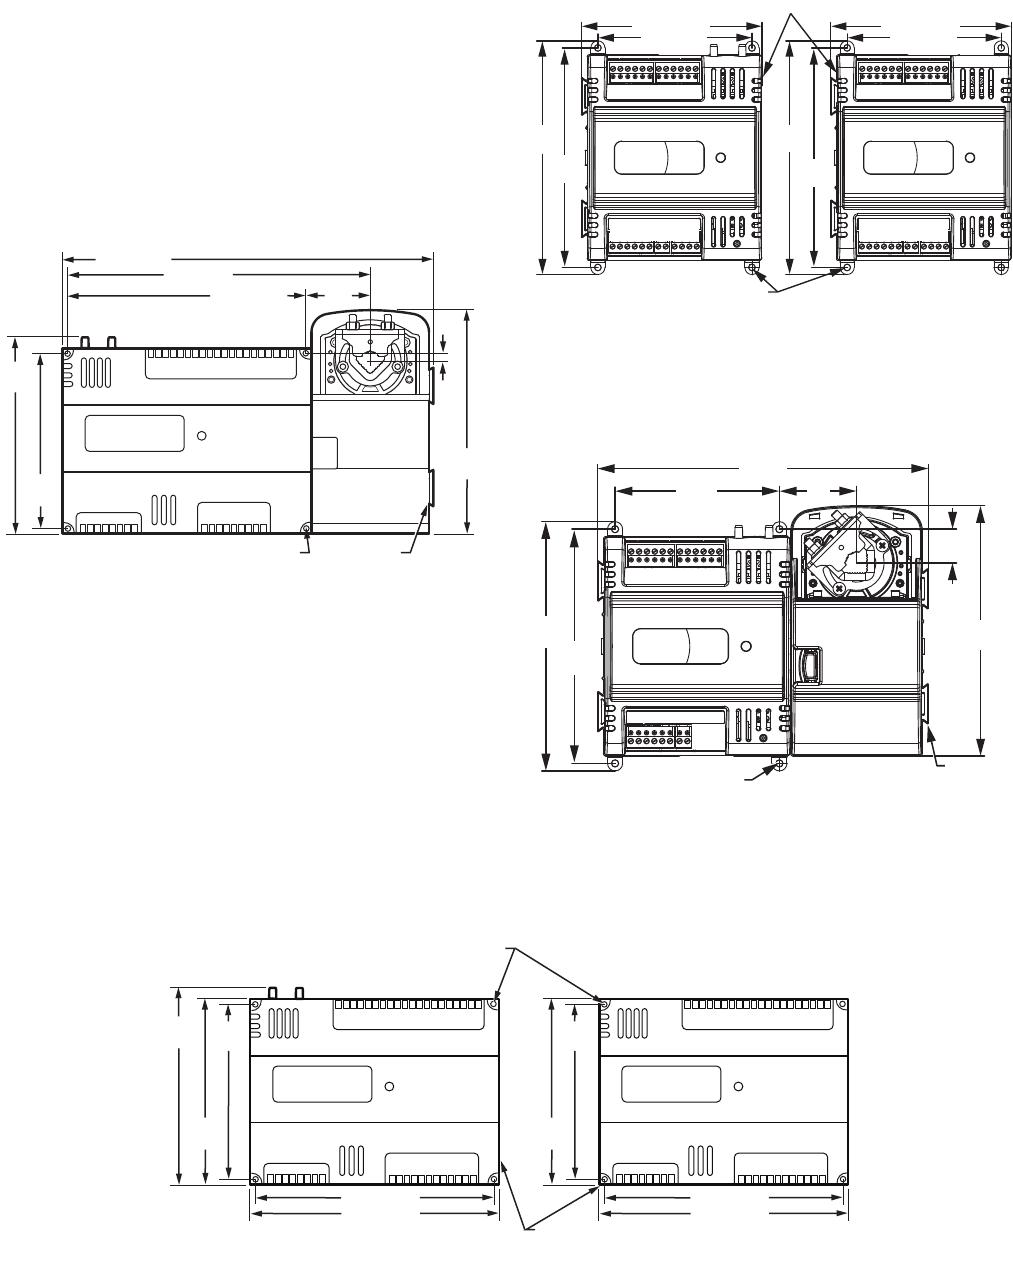 Honeywell Spyder Fpb Wiring Diagram Trusted Diagrams Ford Transit 85 T260 Fuse Box Pvl Car U2022